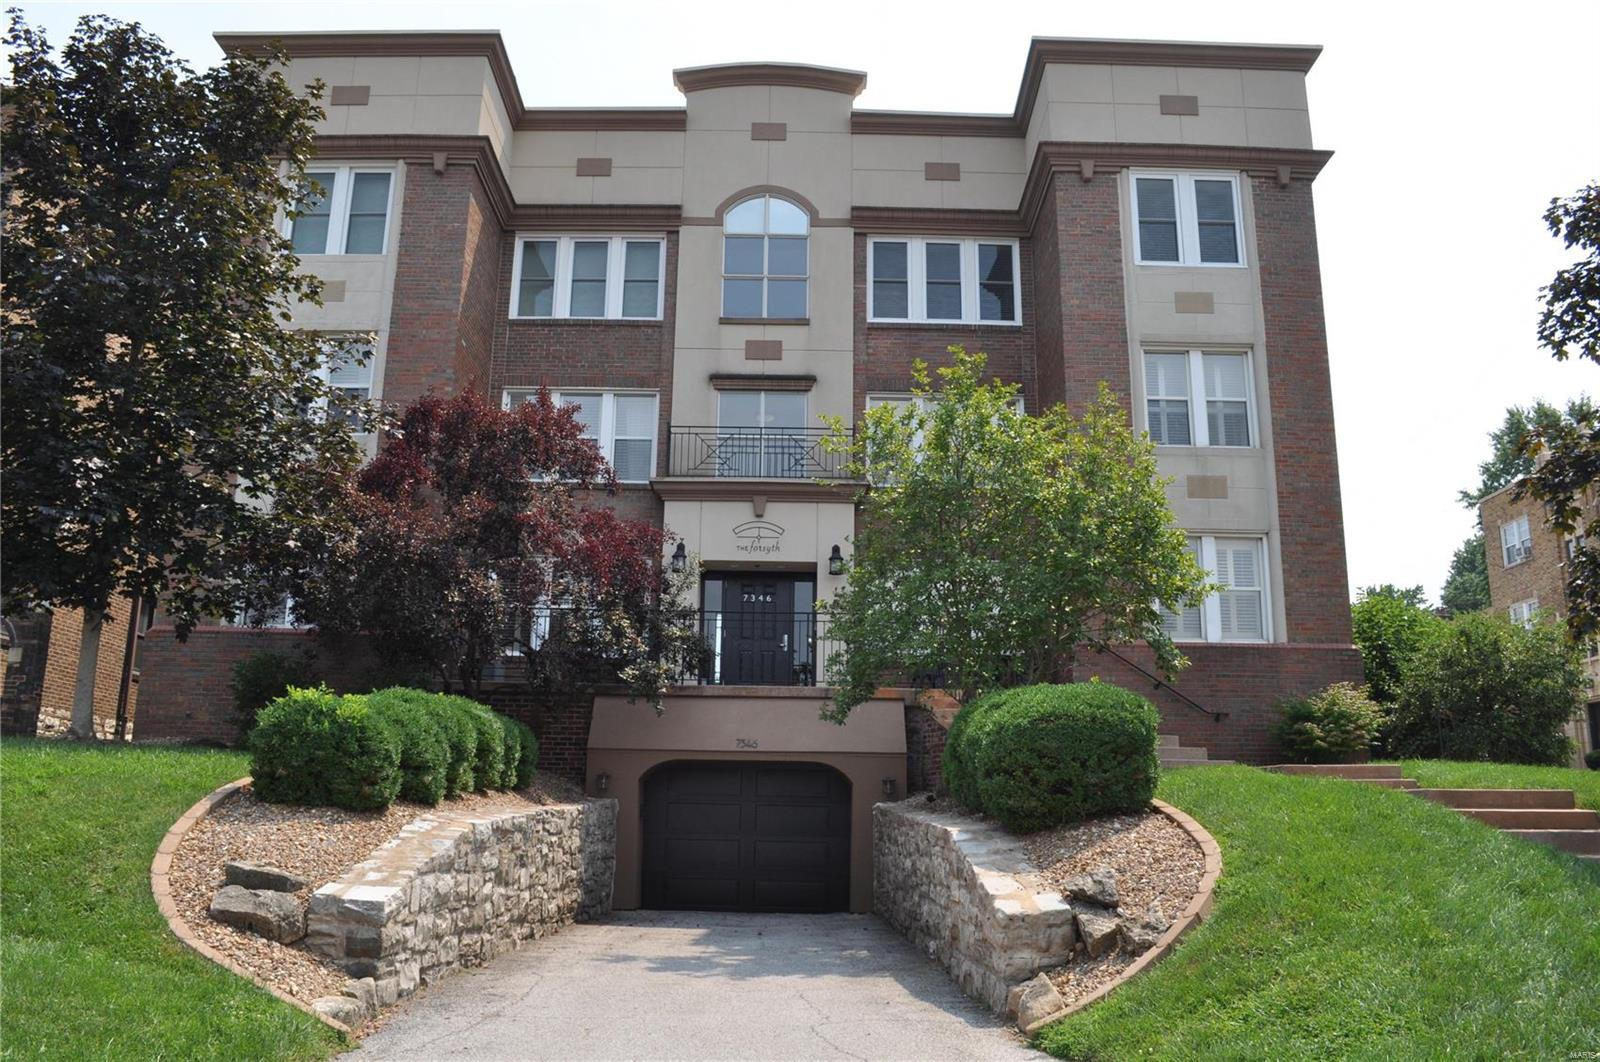 7346 Forsyth Blvd Condo Real Estate Listings Main Image